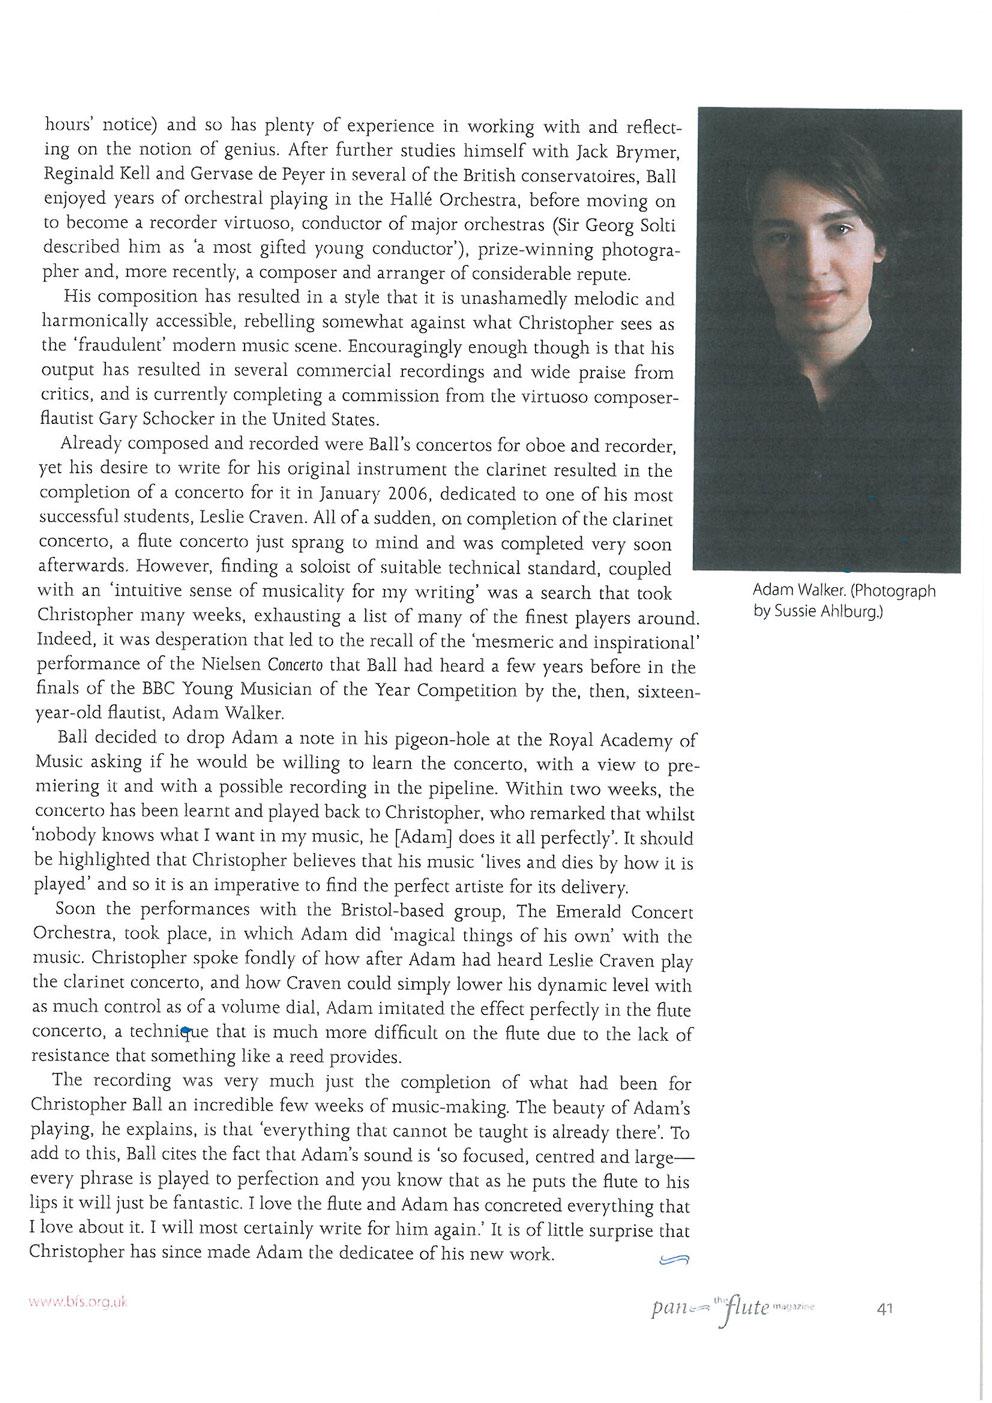 Interview, 2007, Pan, p5